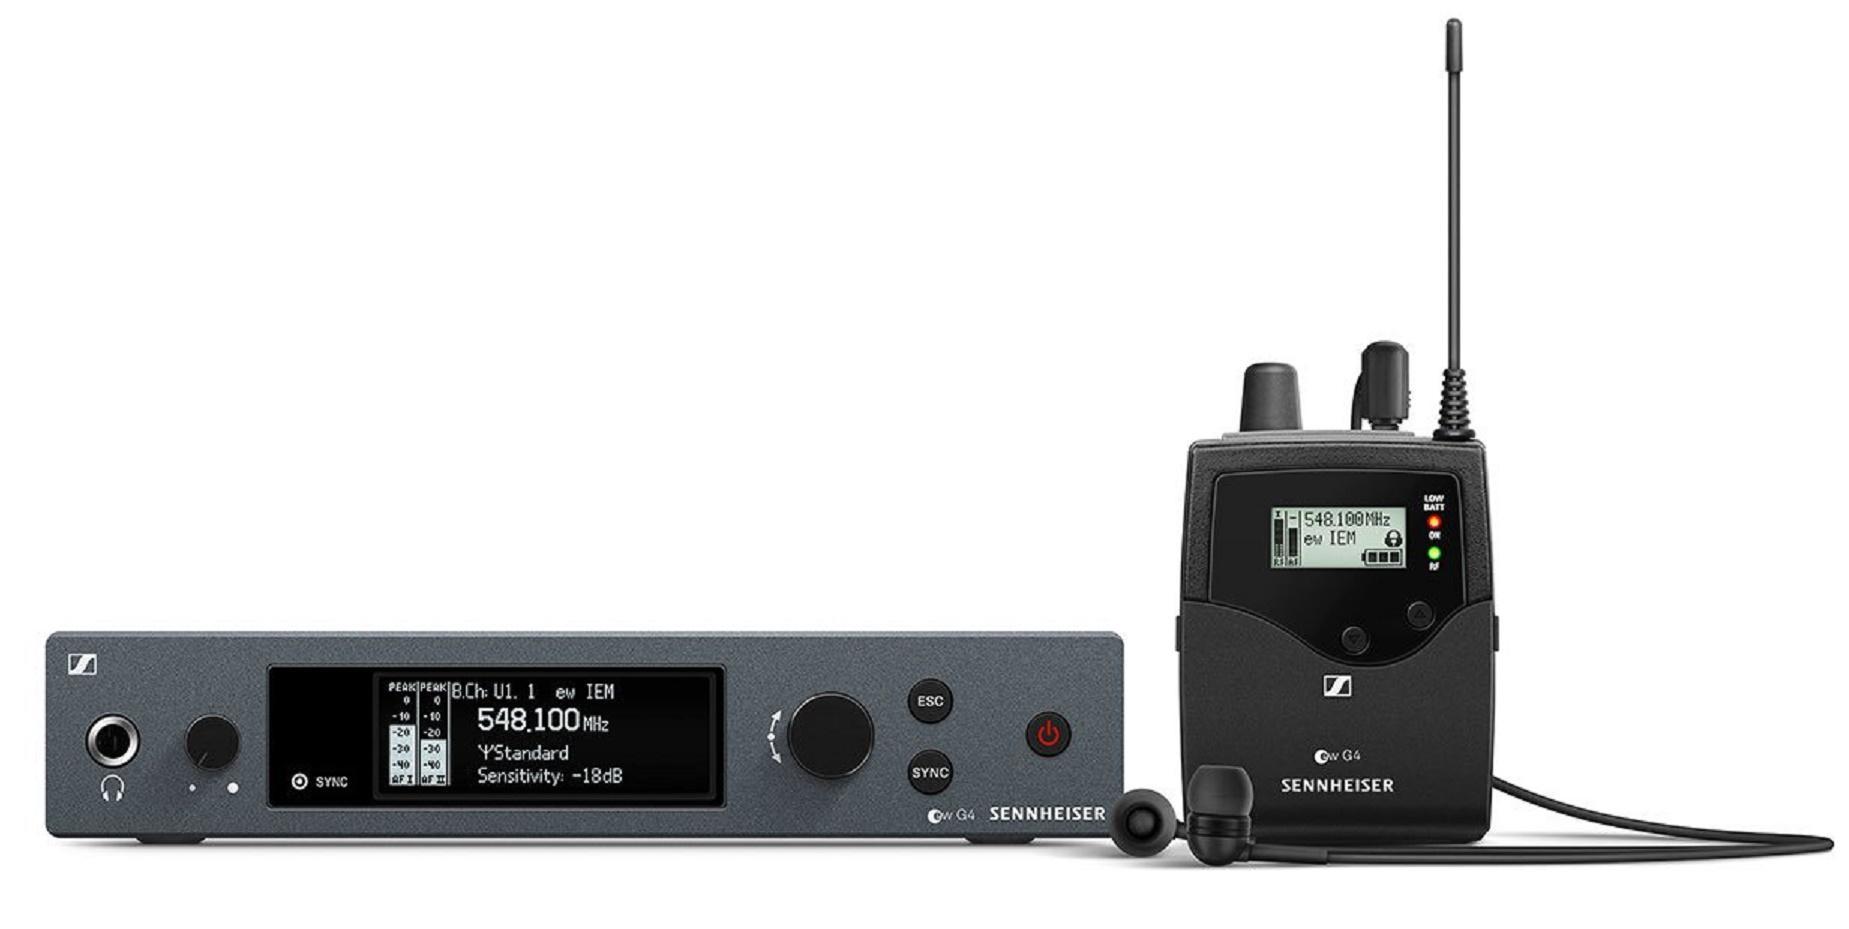 Sennheiser Ew IEM G4 Sistema de Monitor In-Ear